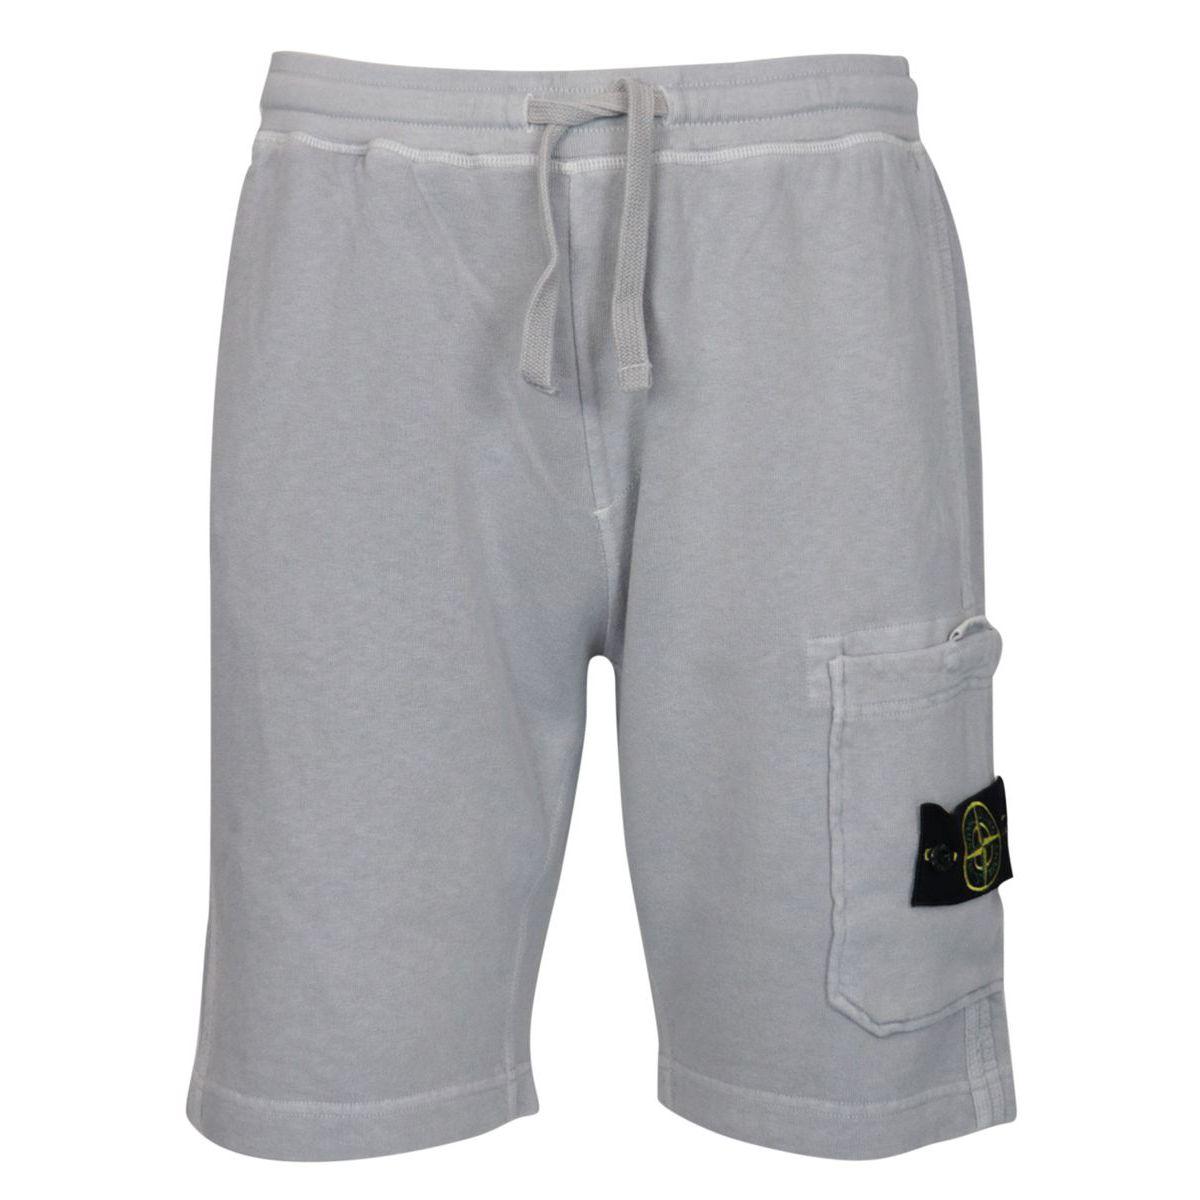 Regular-fit bermuda shorts in aged effect cotton fleece Powder Stone Island